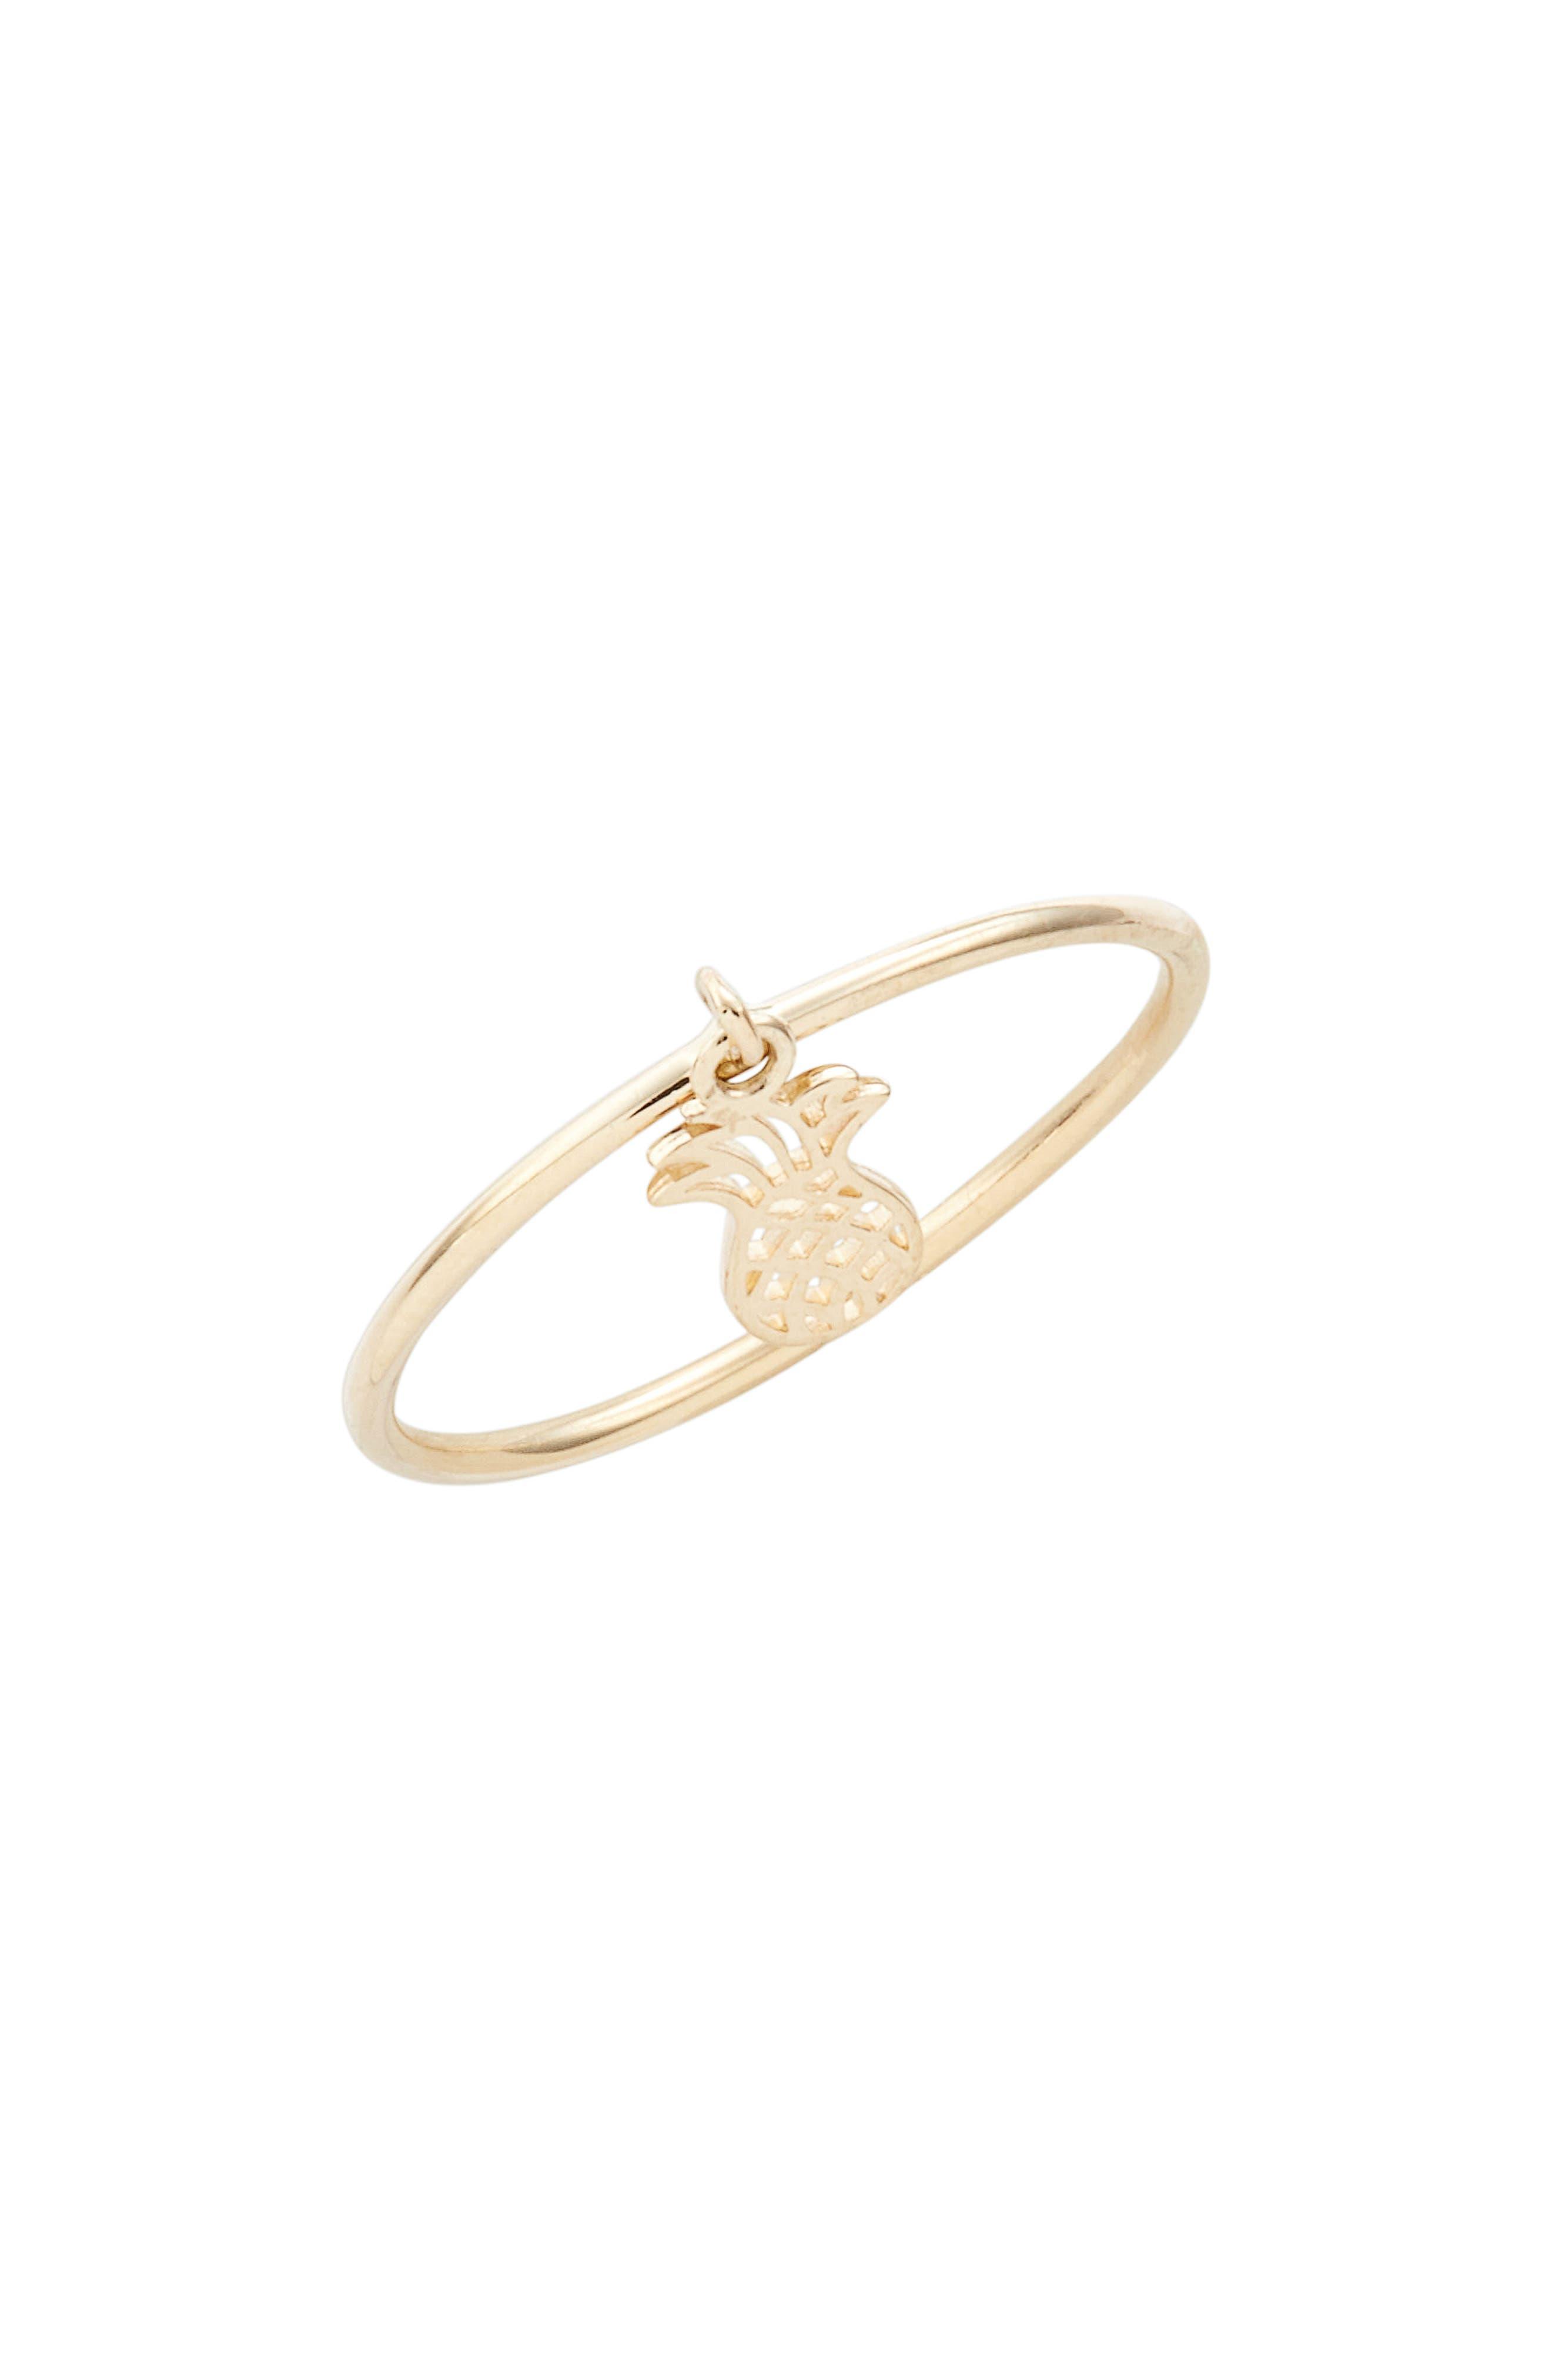 Alternate Image 1 Selected - Poppy Finch Skinny Dangling Pineapple Charm Ring